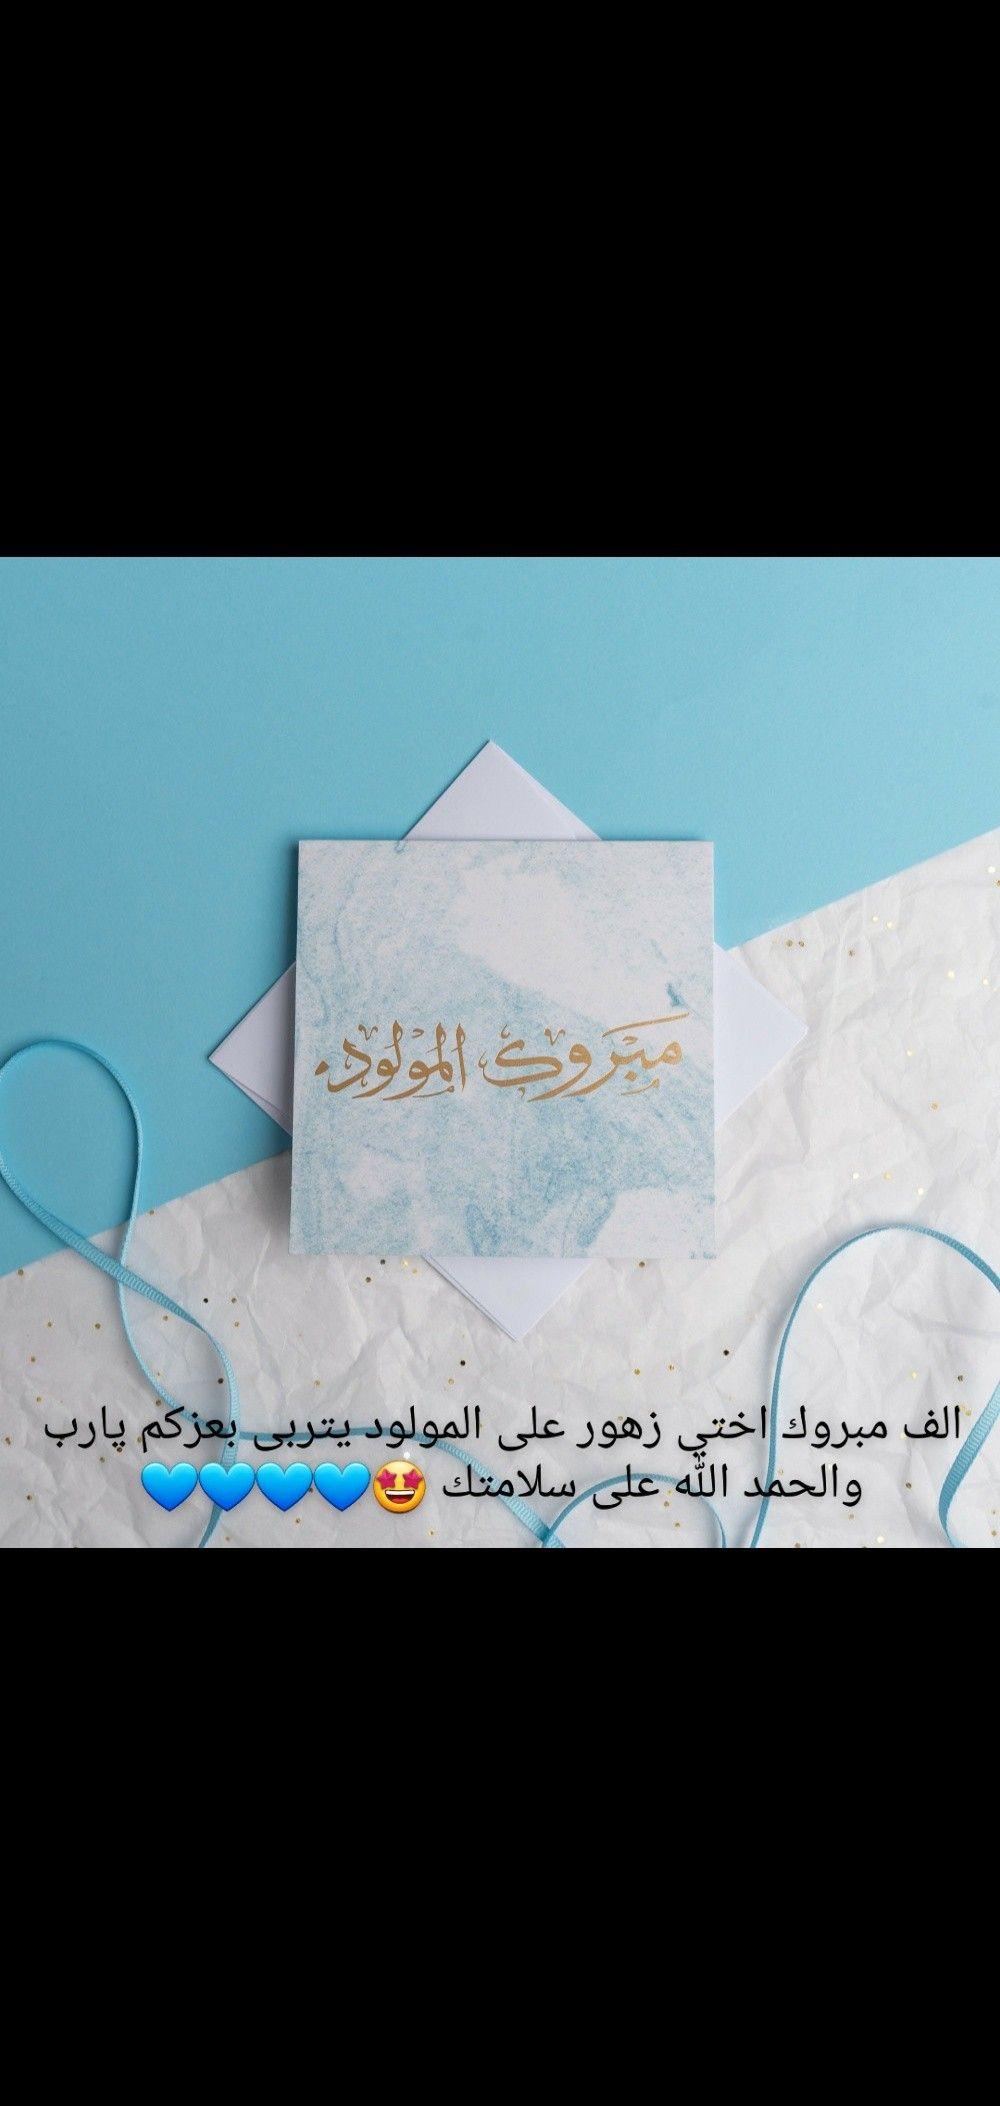 Pin By Jamilah On Allah Islam Allah Islam Poster Movie Posters